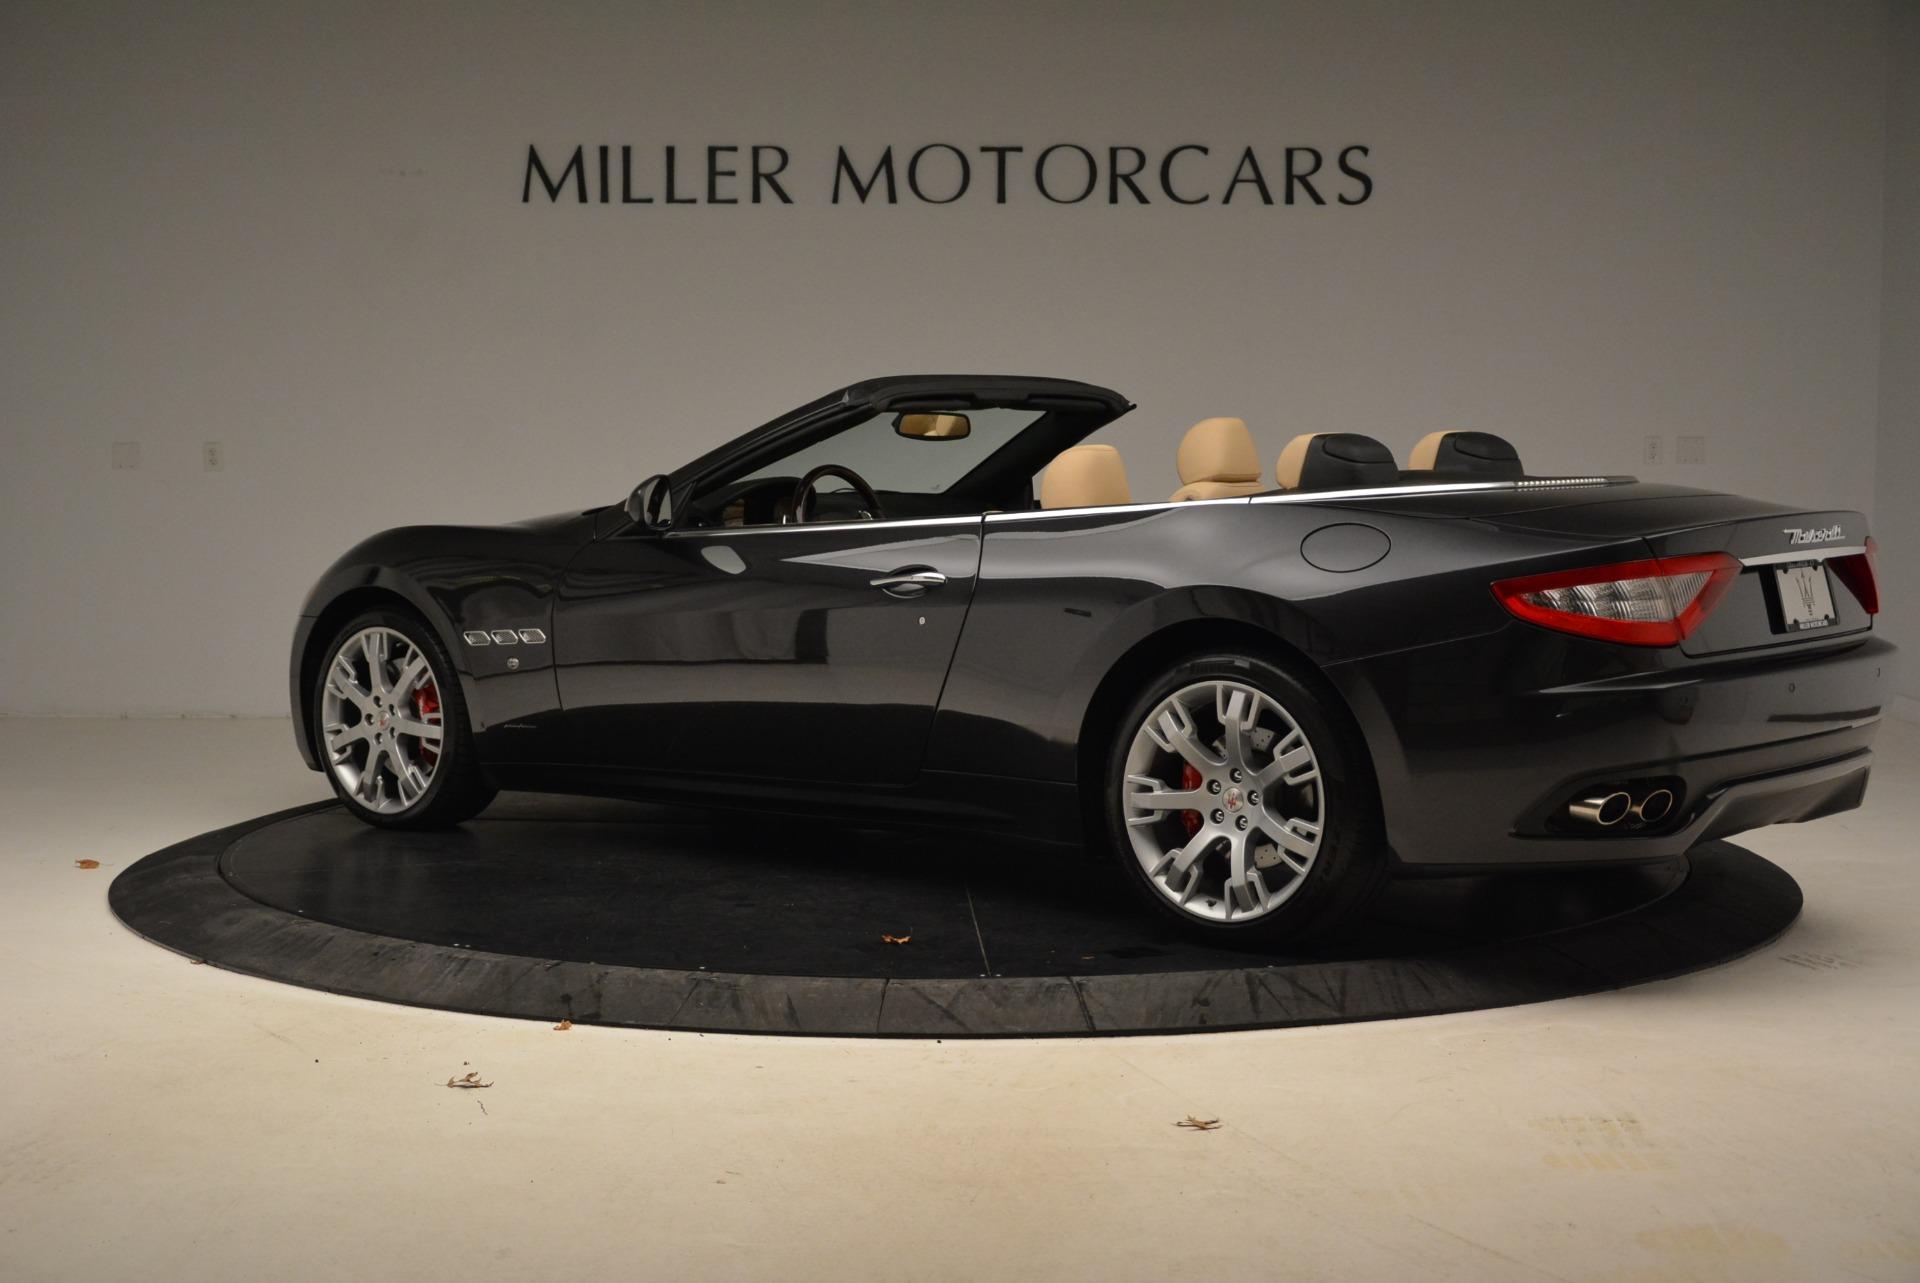 Used 2013 Maserati GranTurismo Convertible  For Sale In Westport, CT 2050_p4